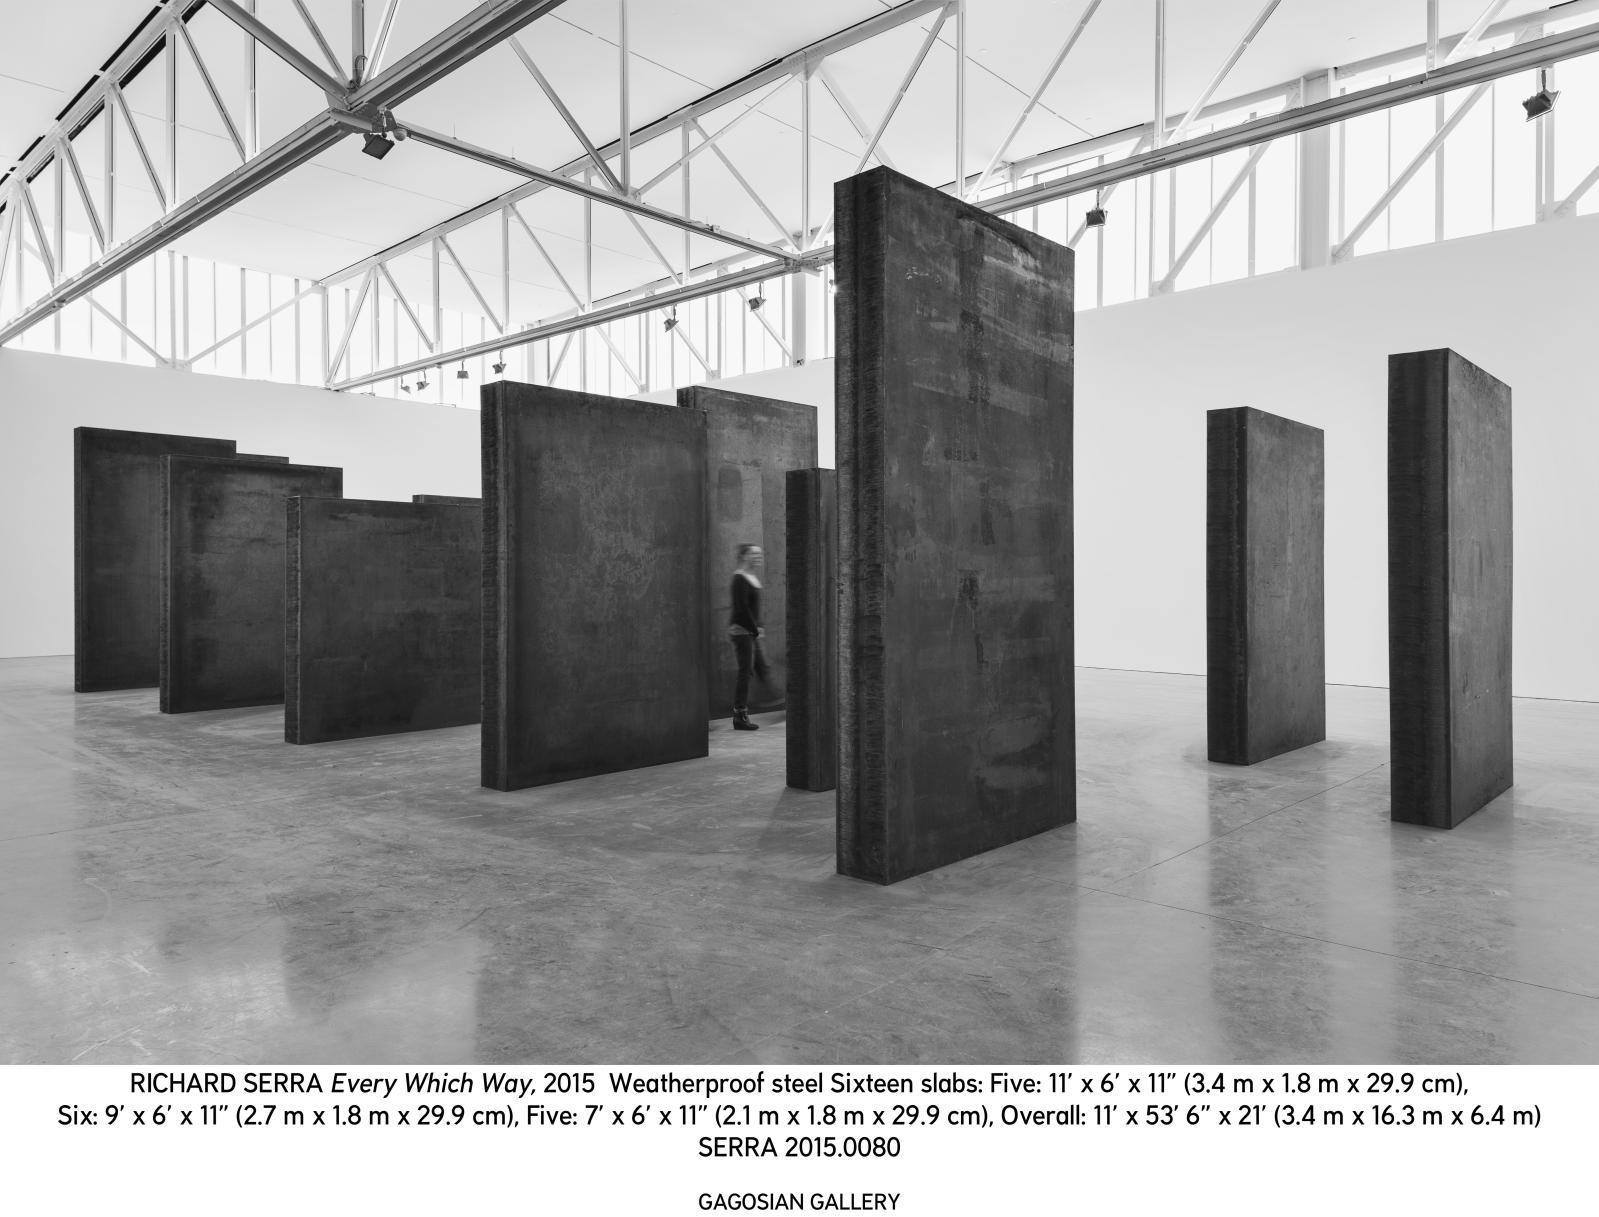 Richard Serra (né en 1939), Every Which Way,2015, acier, galerie Gagosian au 555 West 24th Street, ensemble: 3,40x16,3x6,4m.